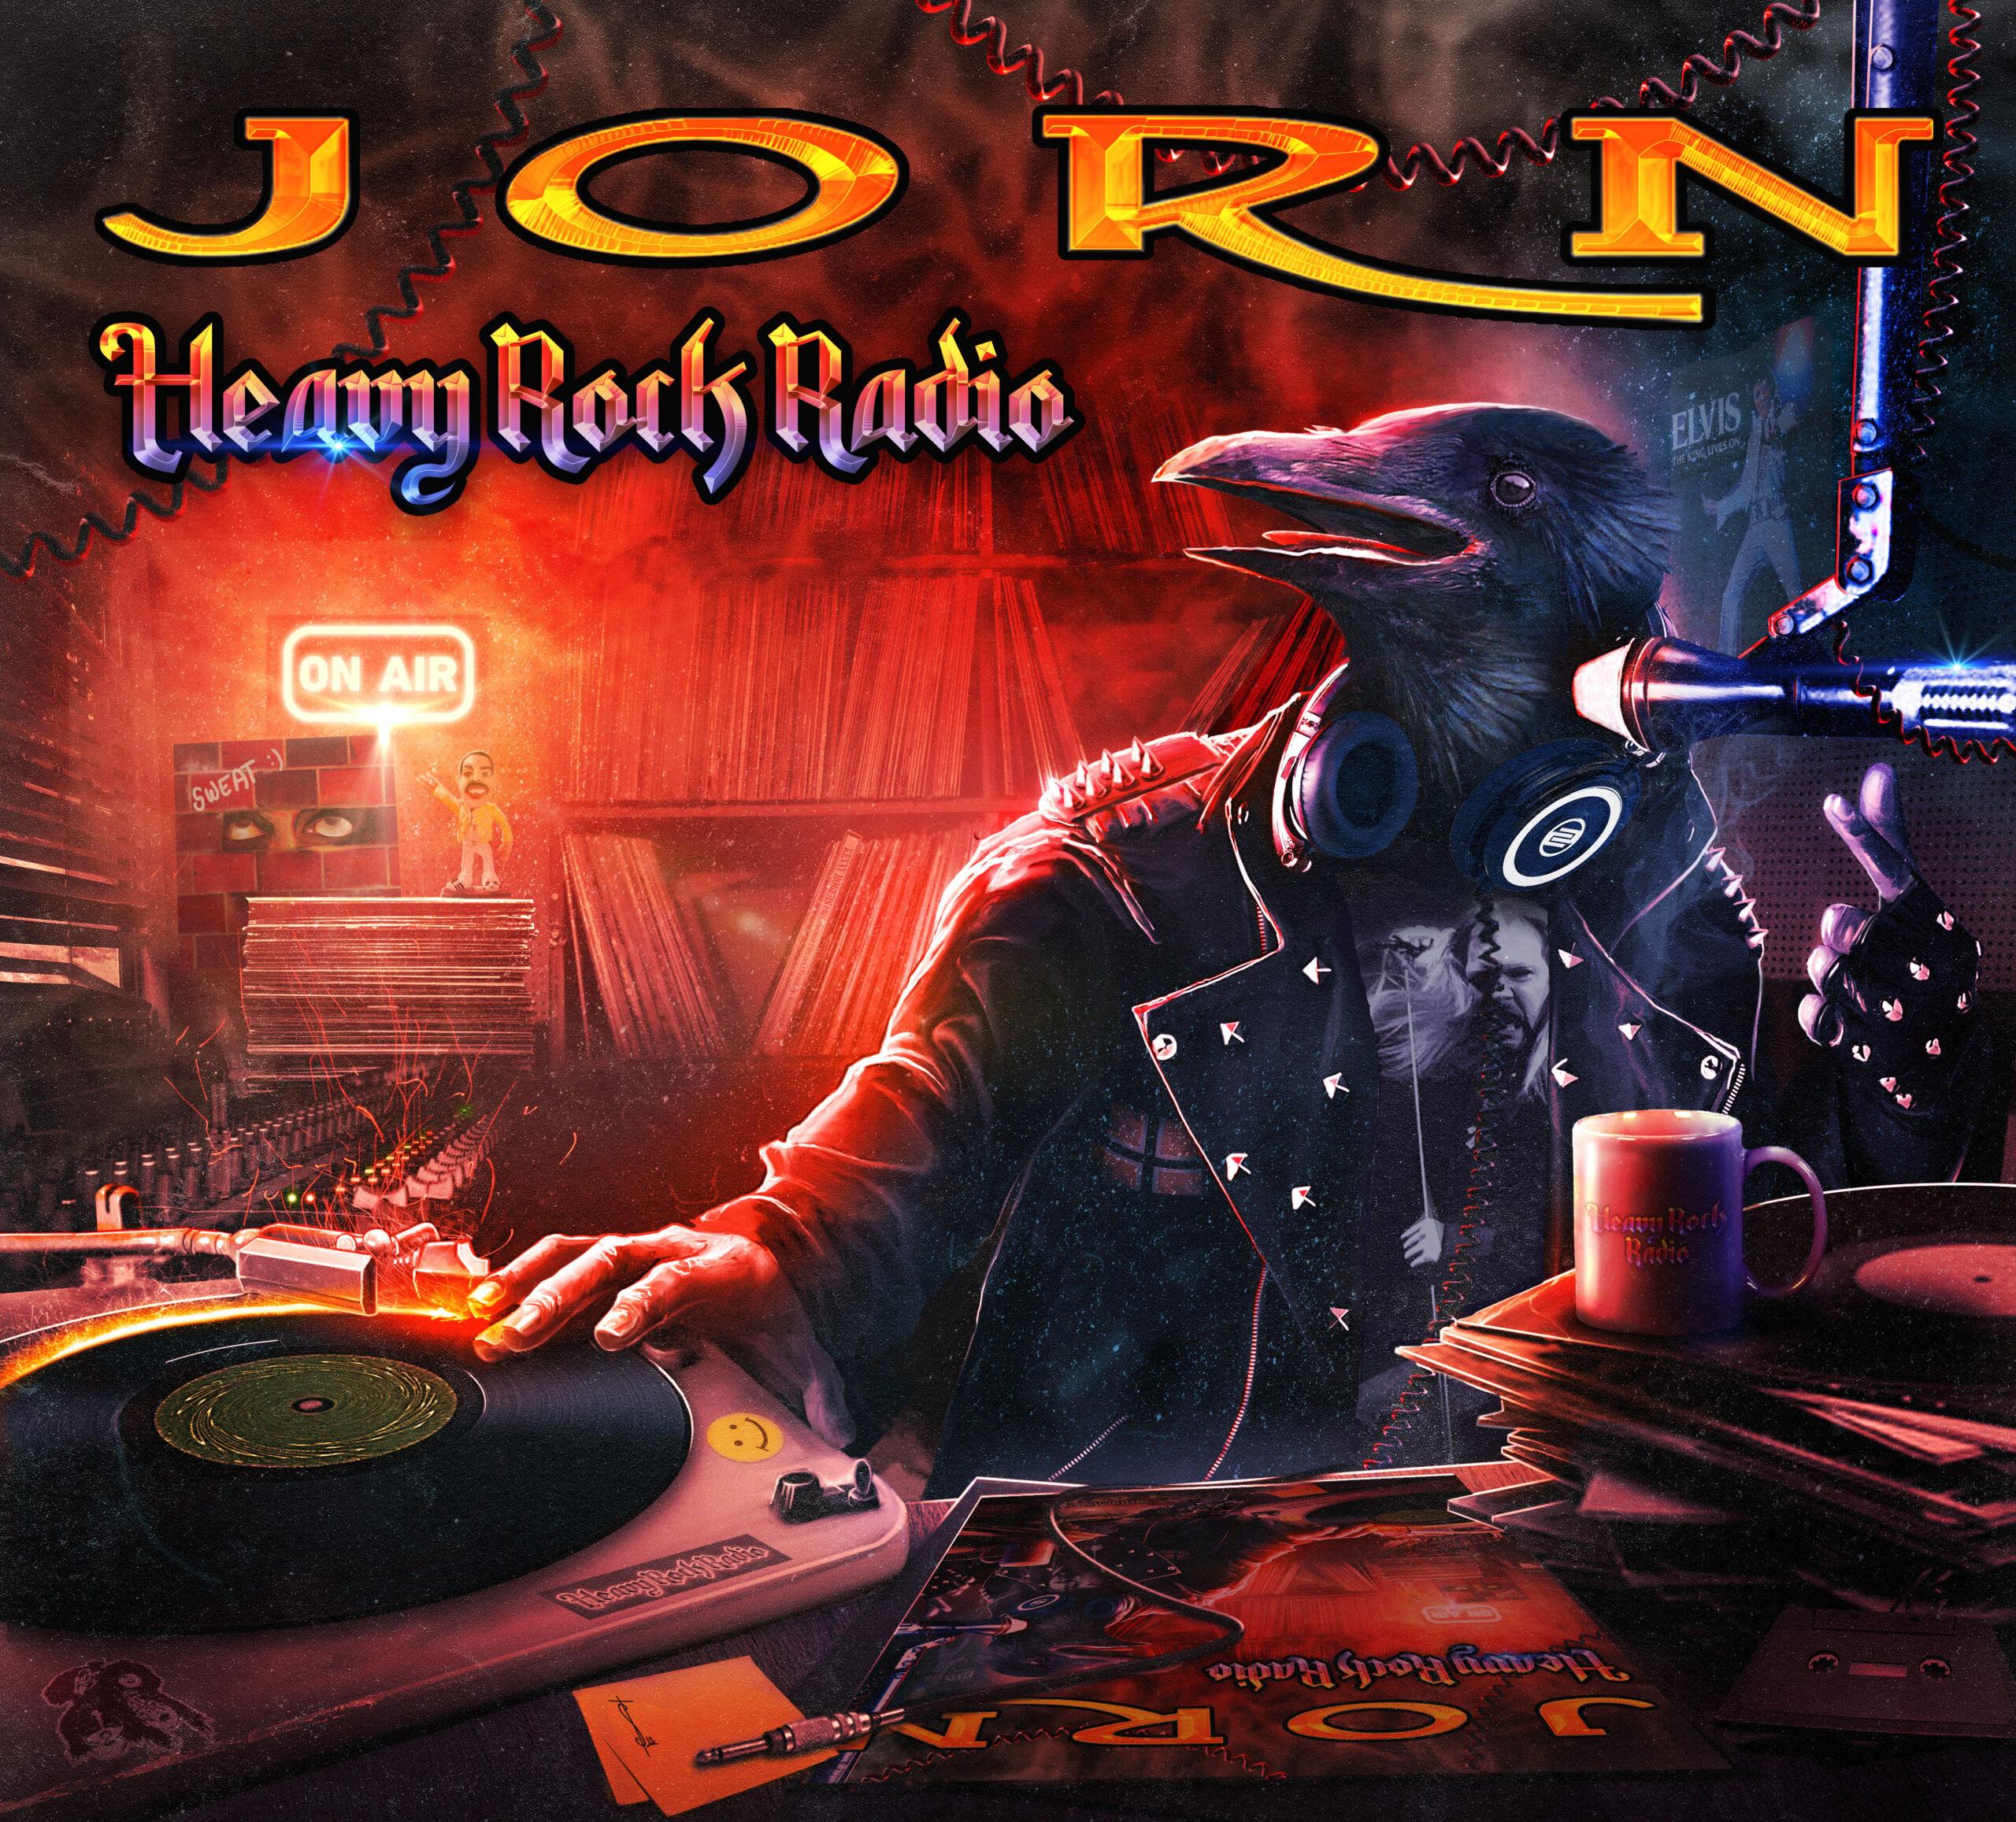 jornheavyrockradio